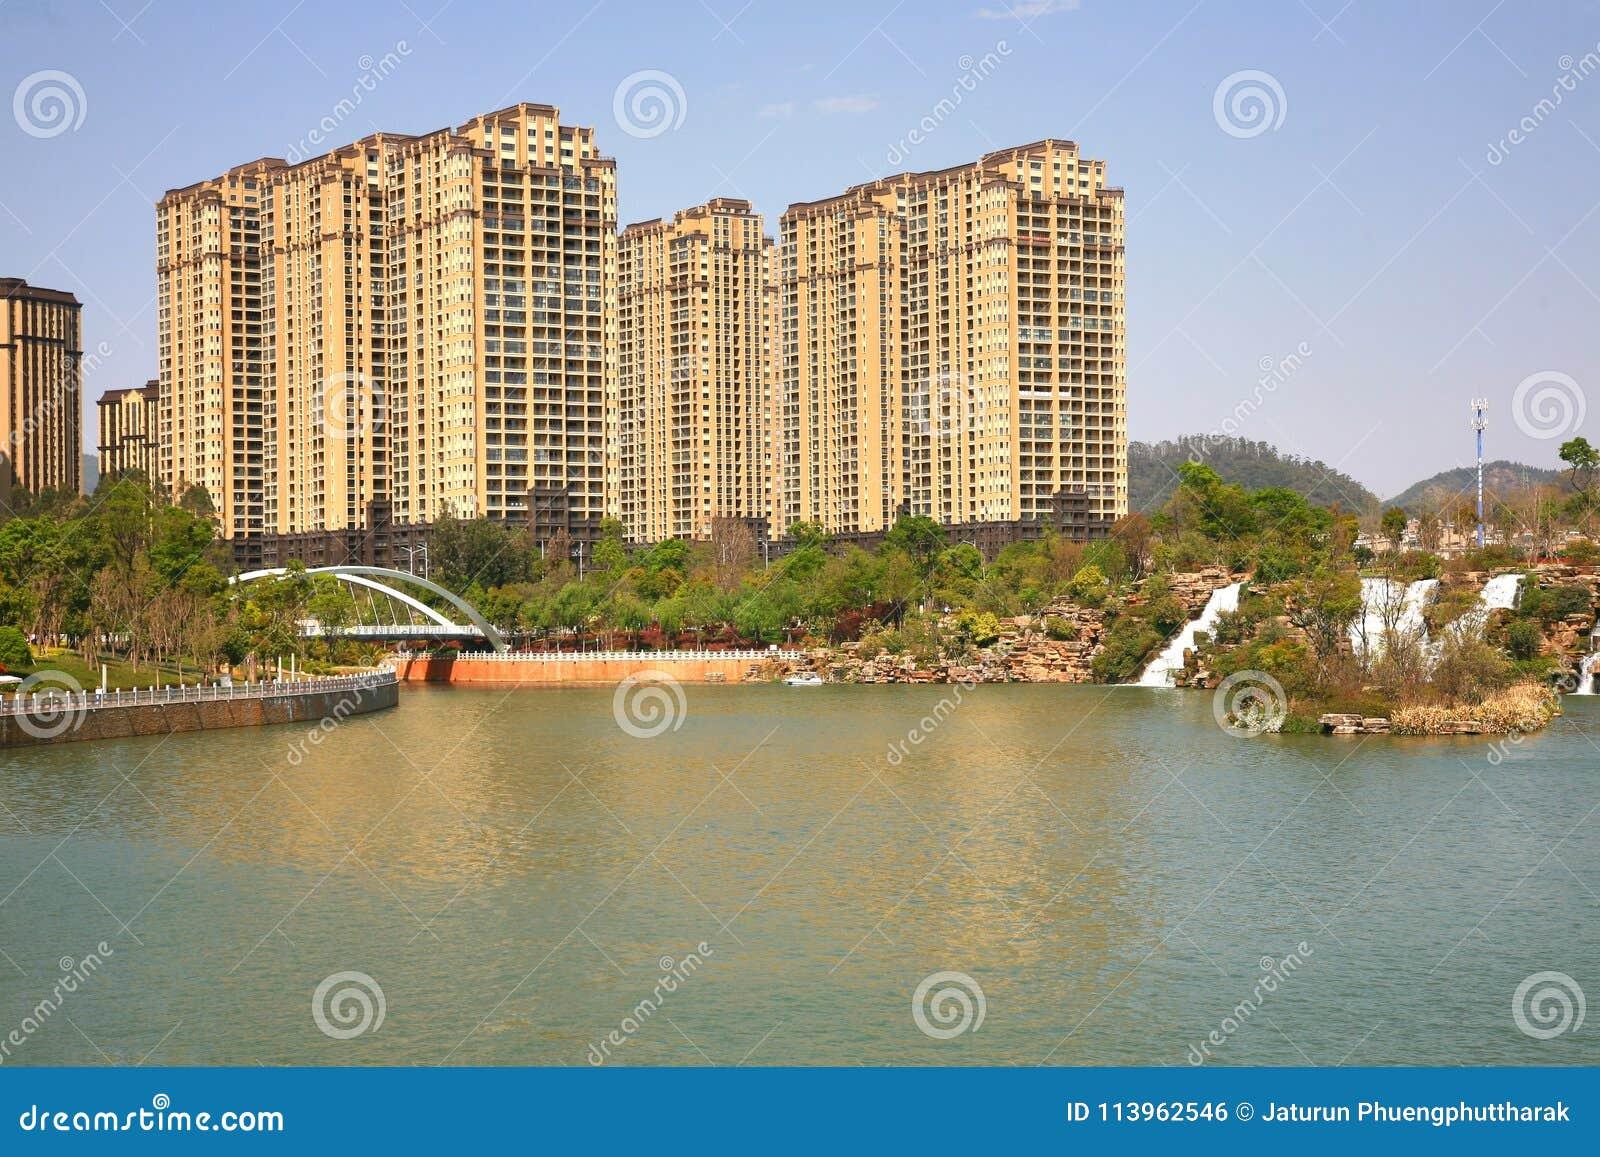 Парк водопада Kunming в Kunming, Китае стал самым большим парком водопада в Азии